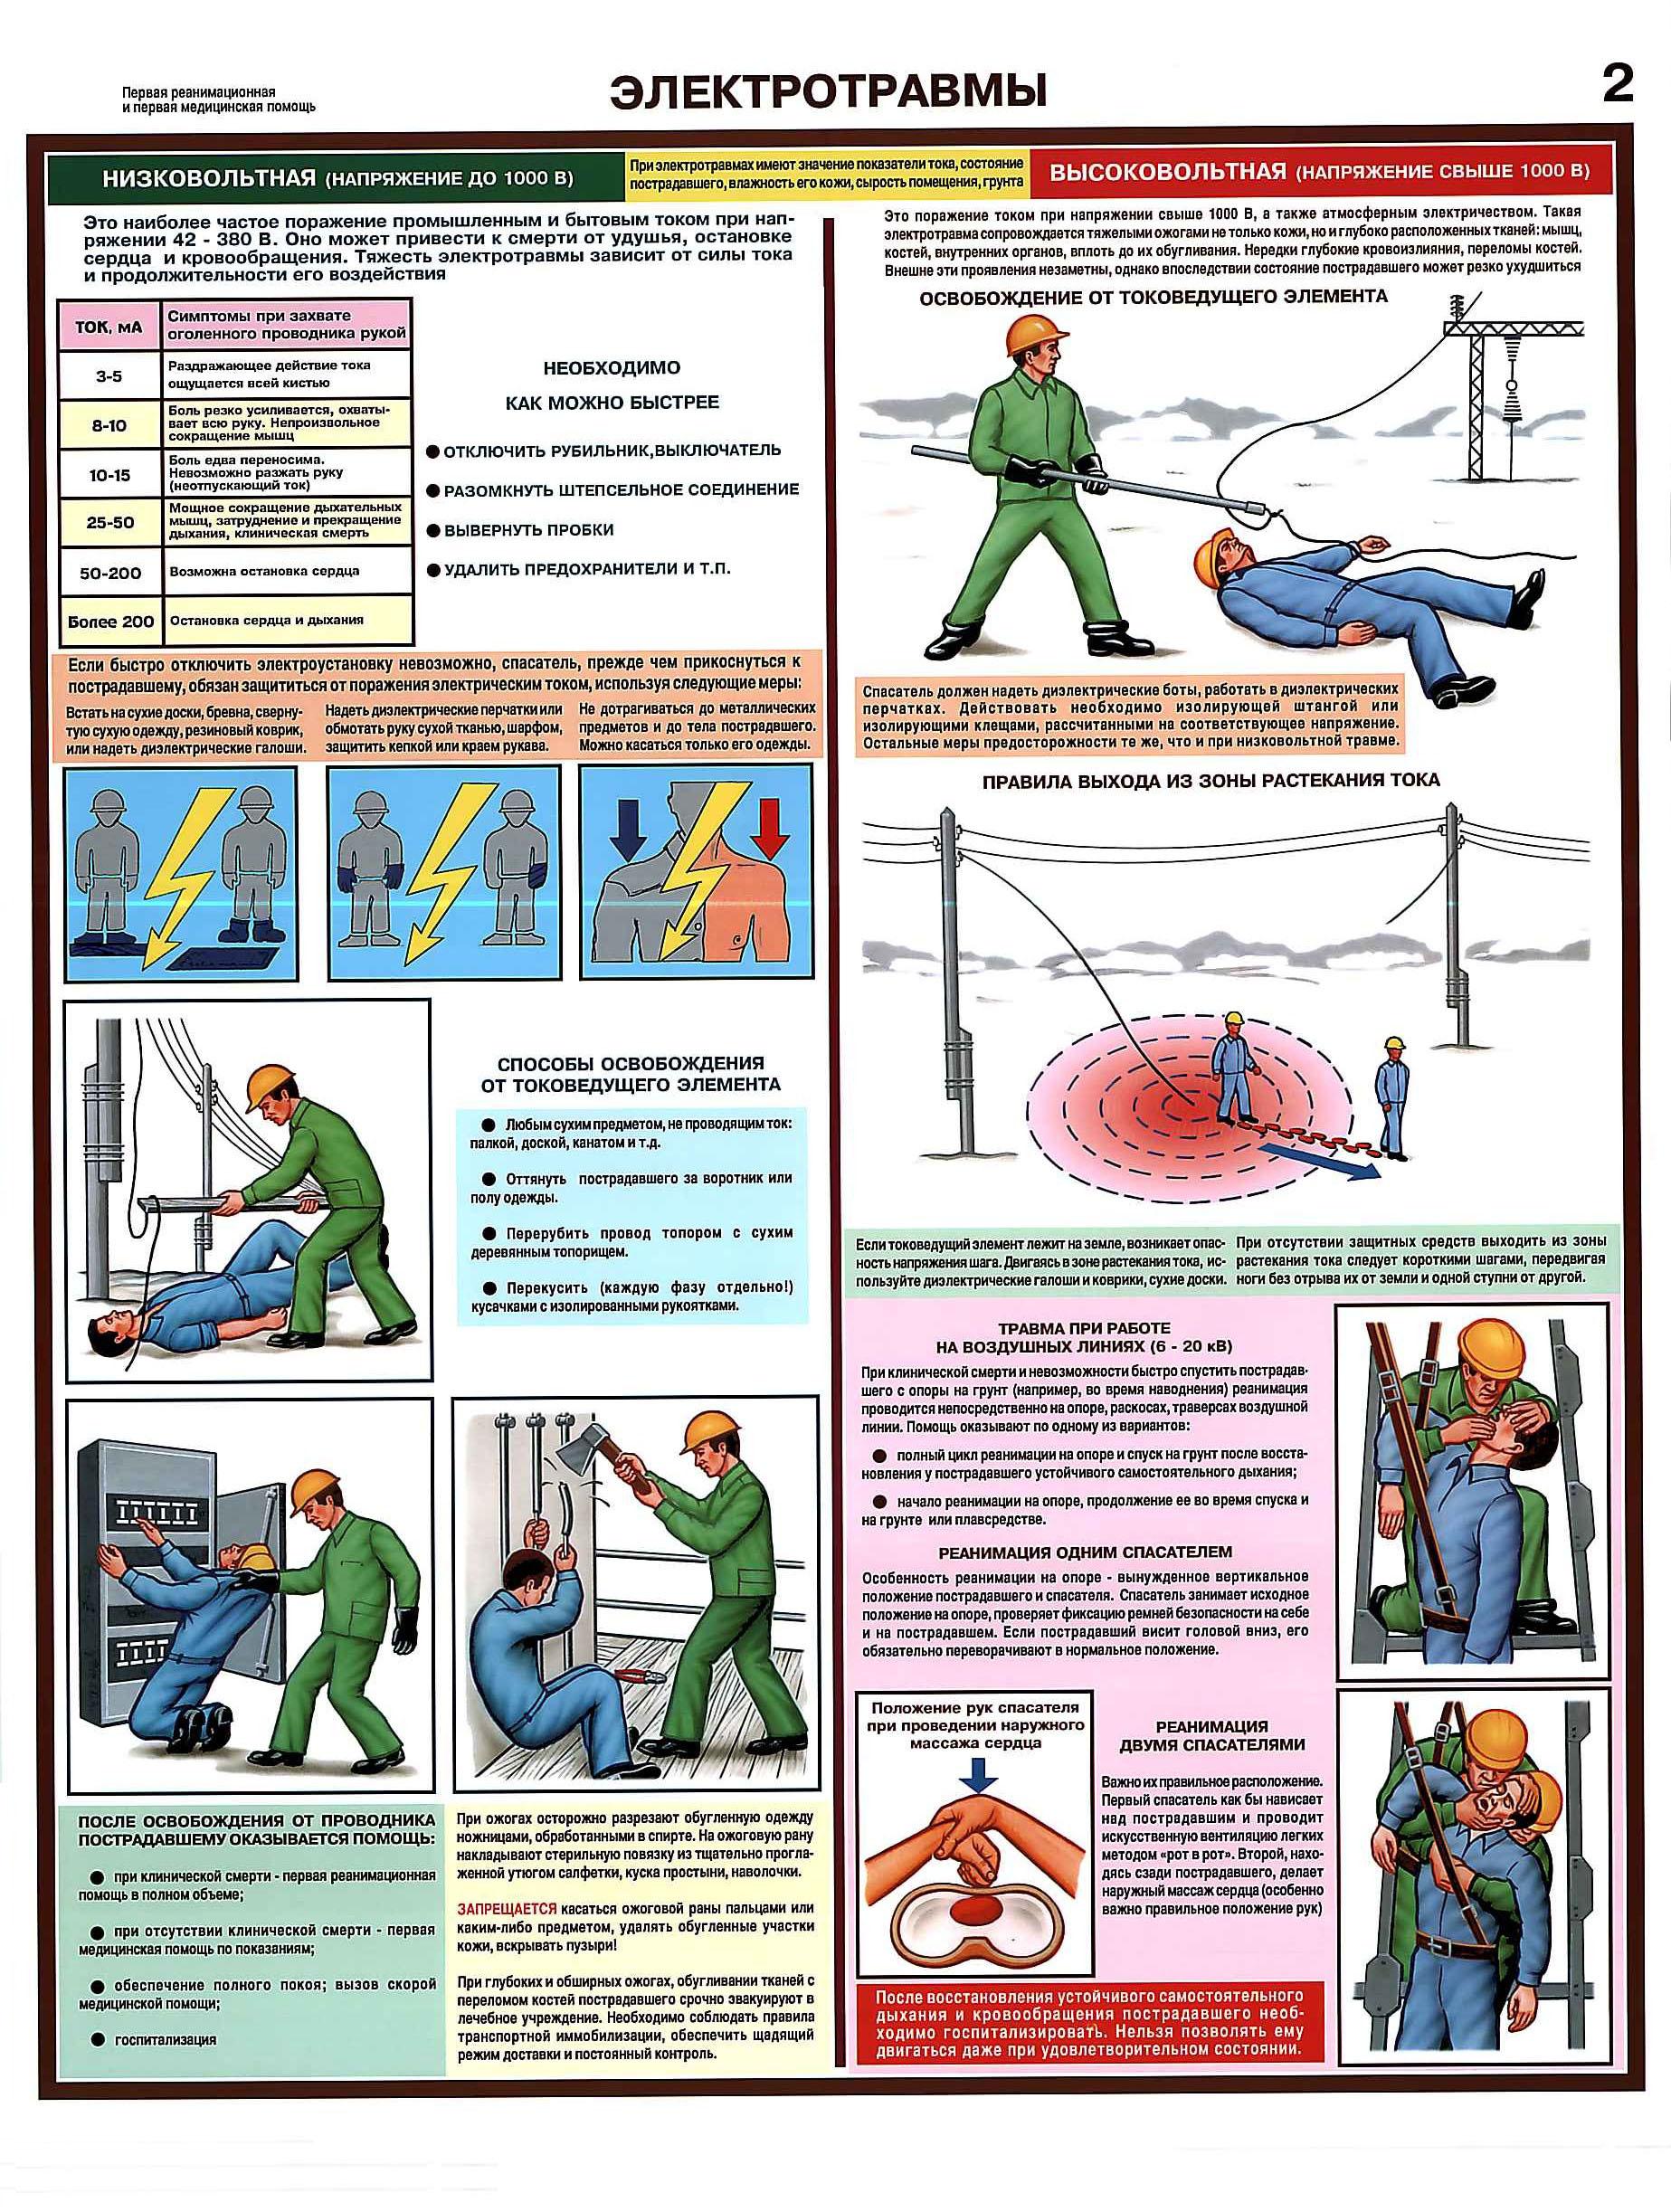 http://веб-механик.рф/images/plakat/med_pomosch/electrotravmy.jpg